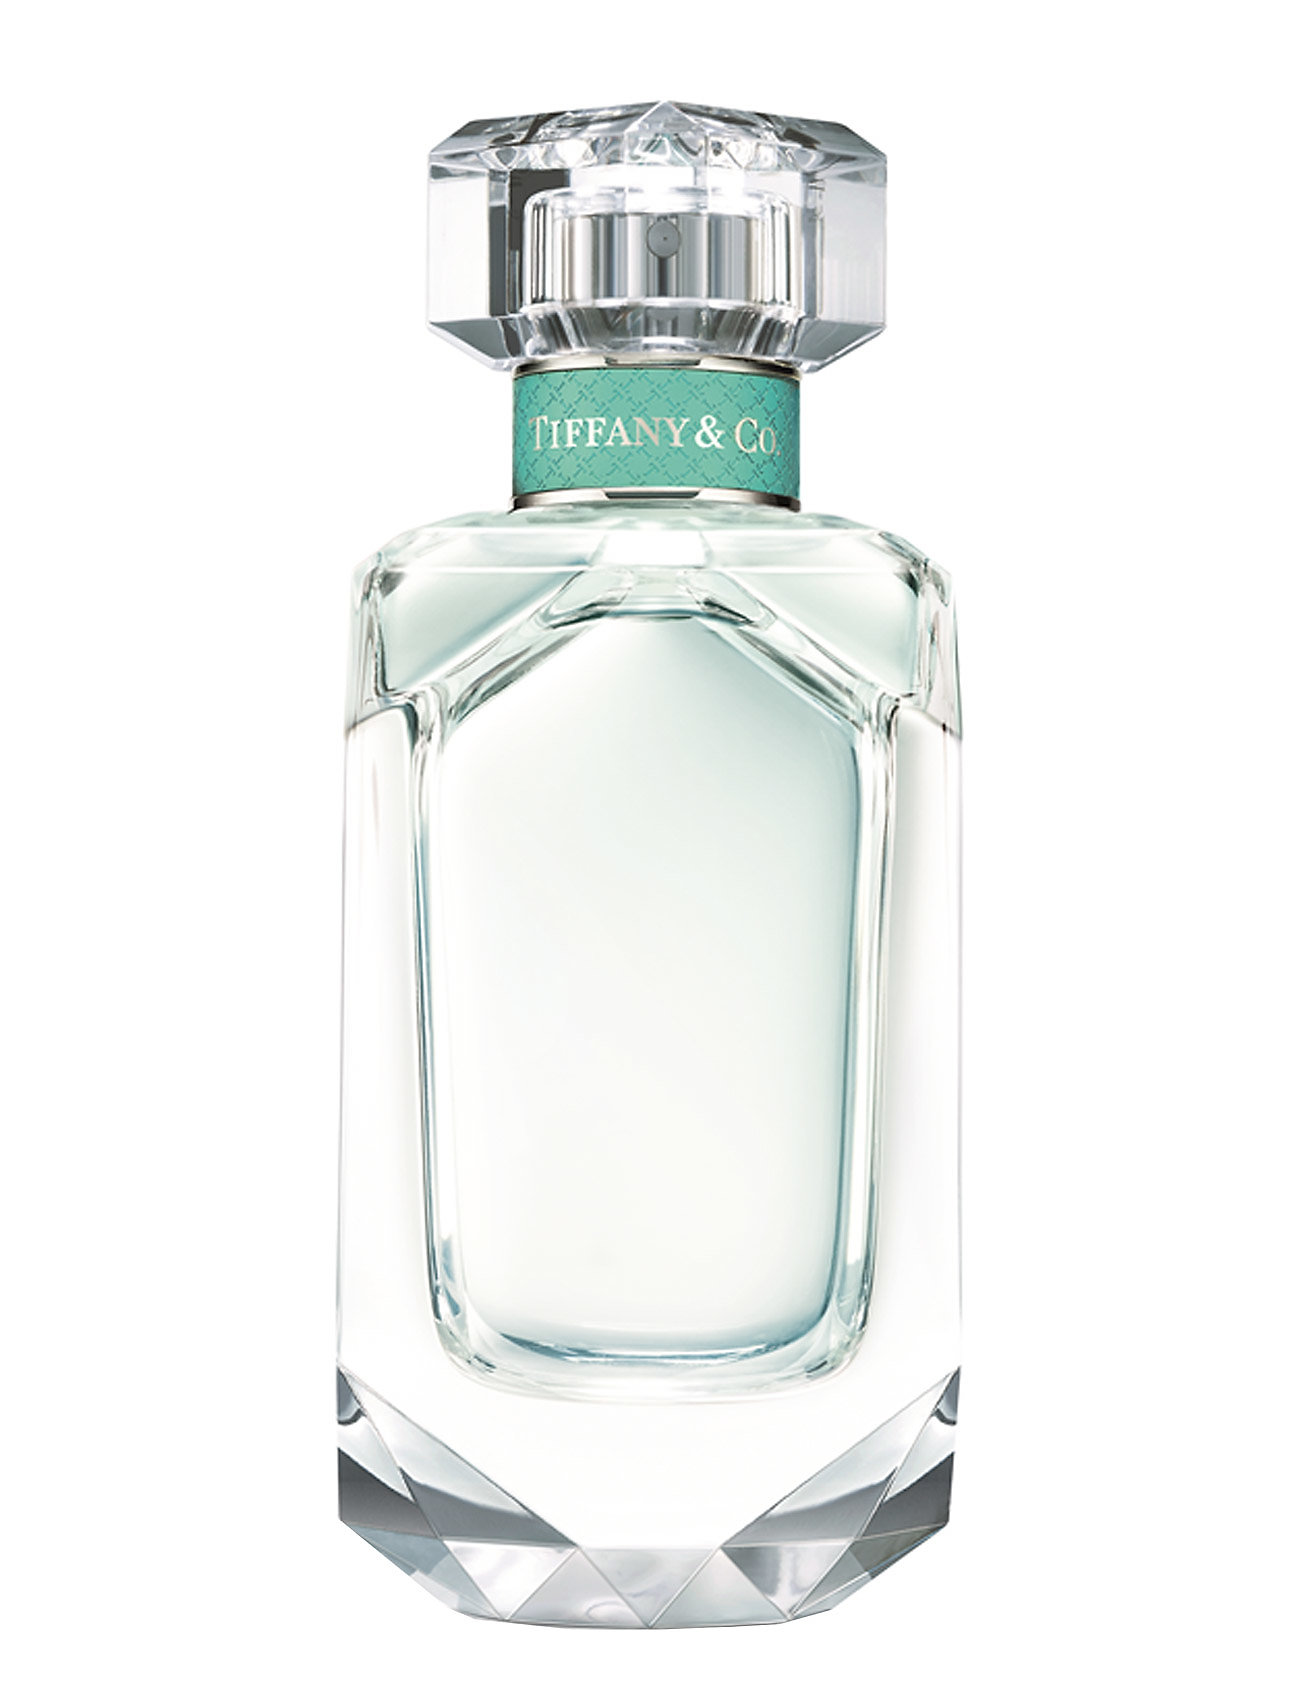 Tiffany TIFFANY & CO EAU DE PARFUM - NO COLOR